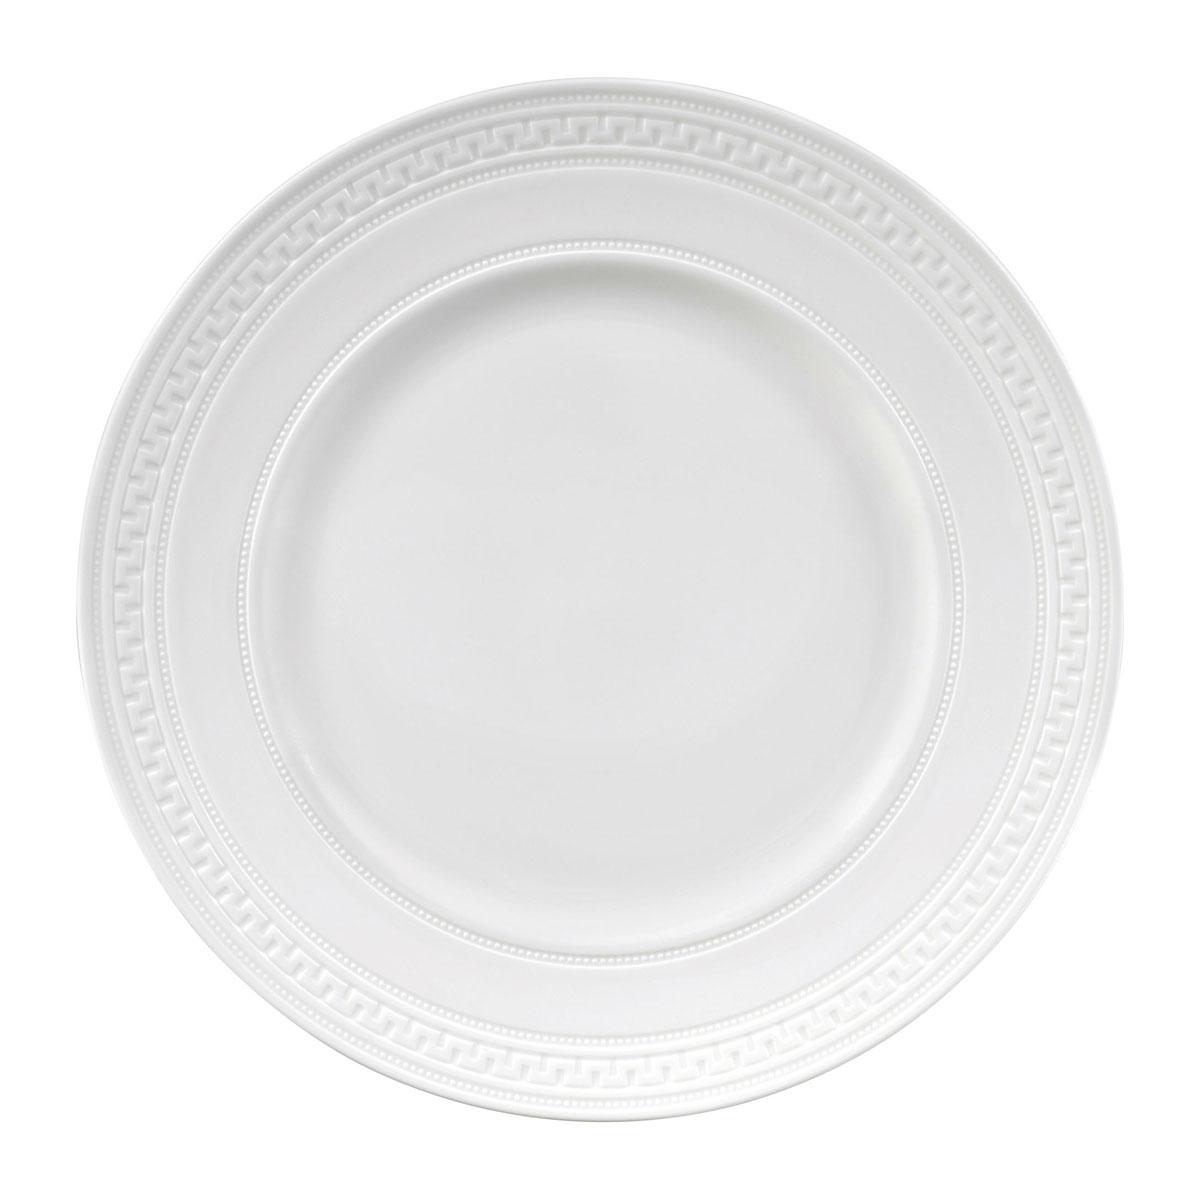 "Wedgwood Intaglio Dinner Plate 10.75"""